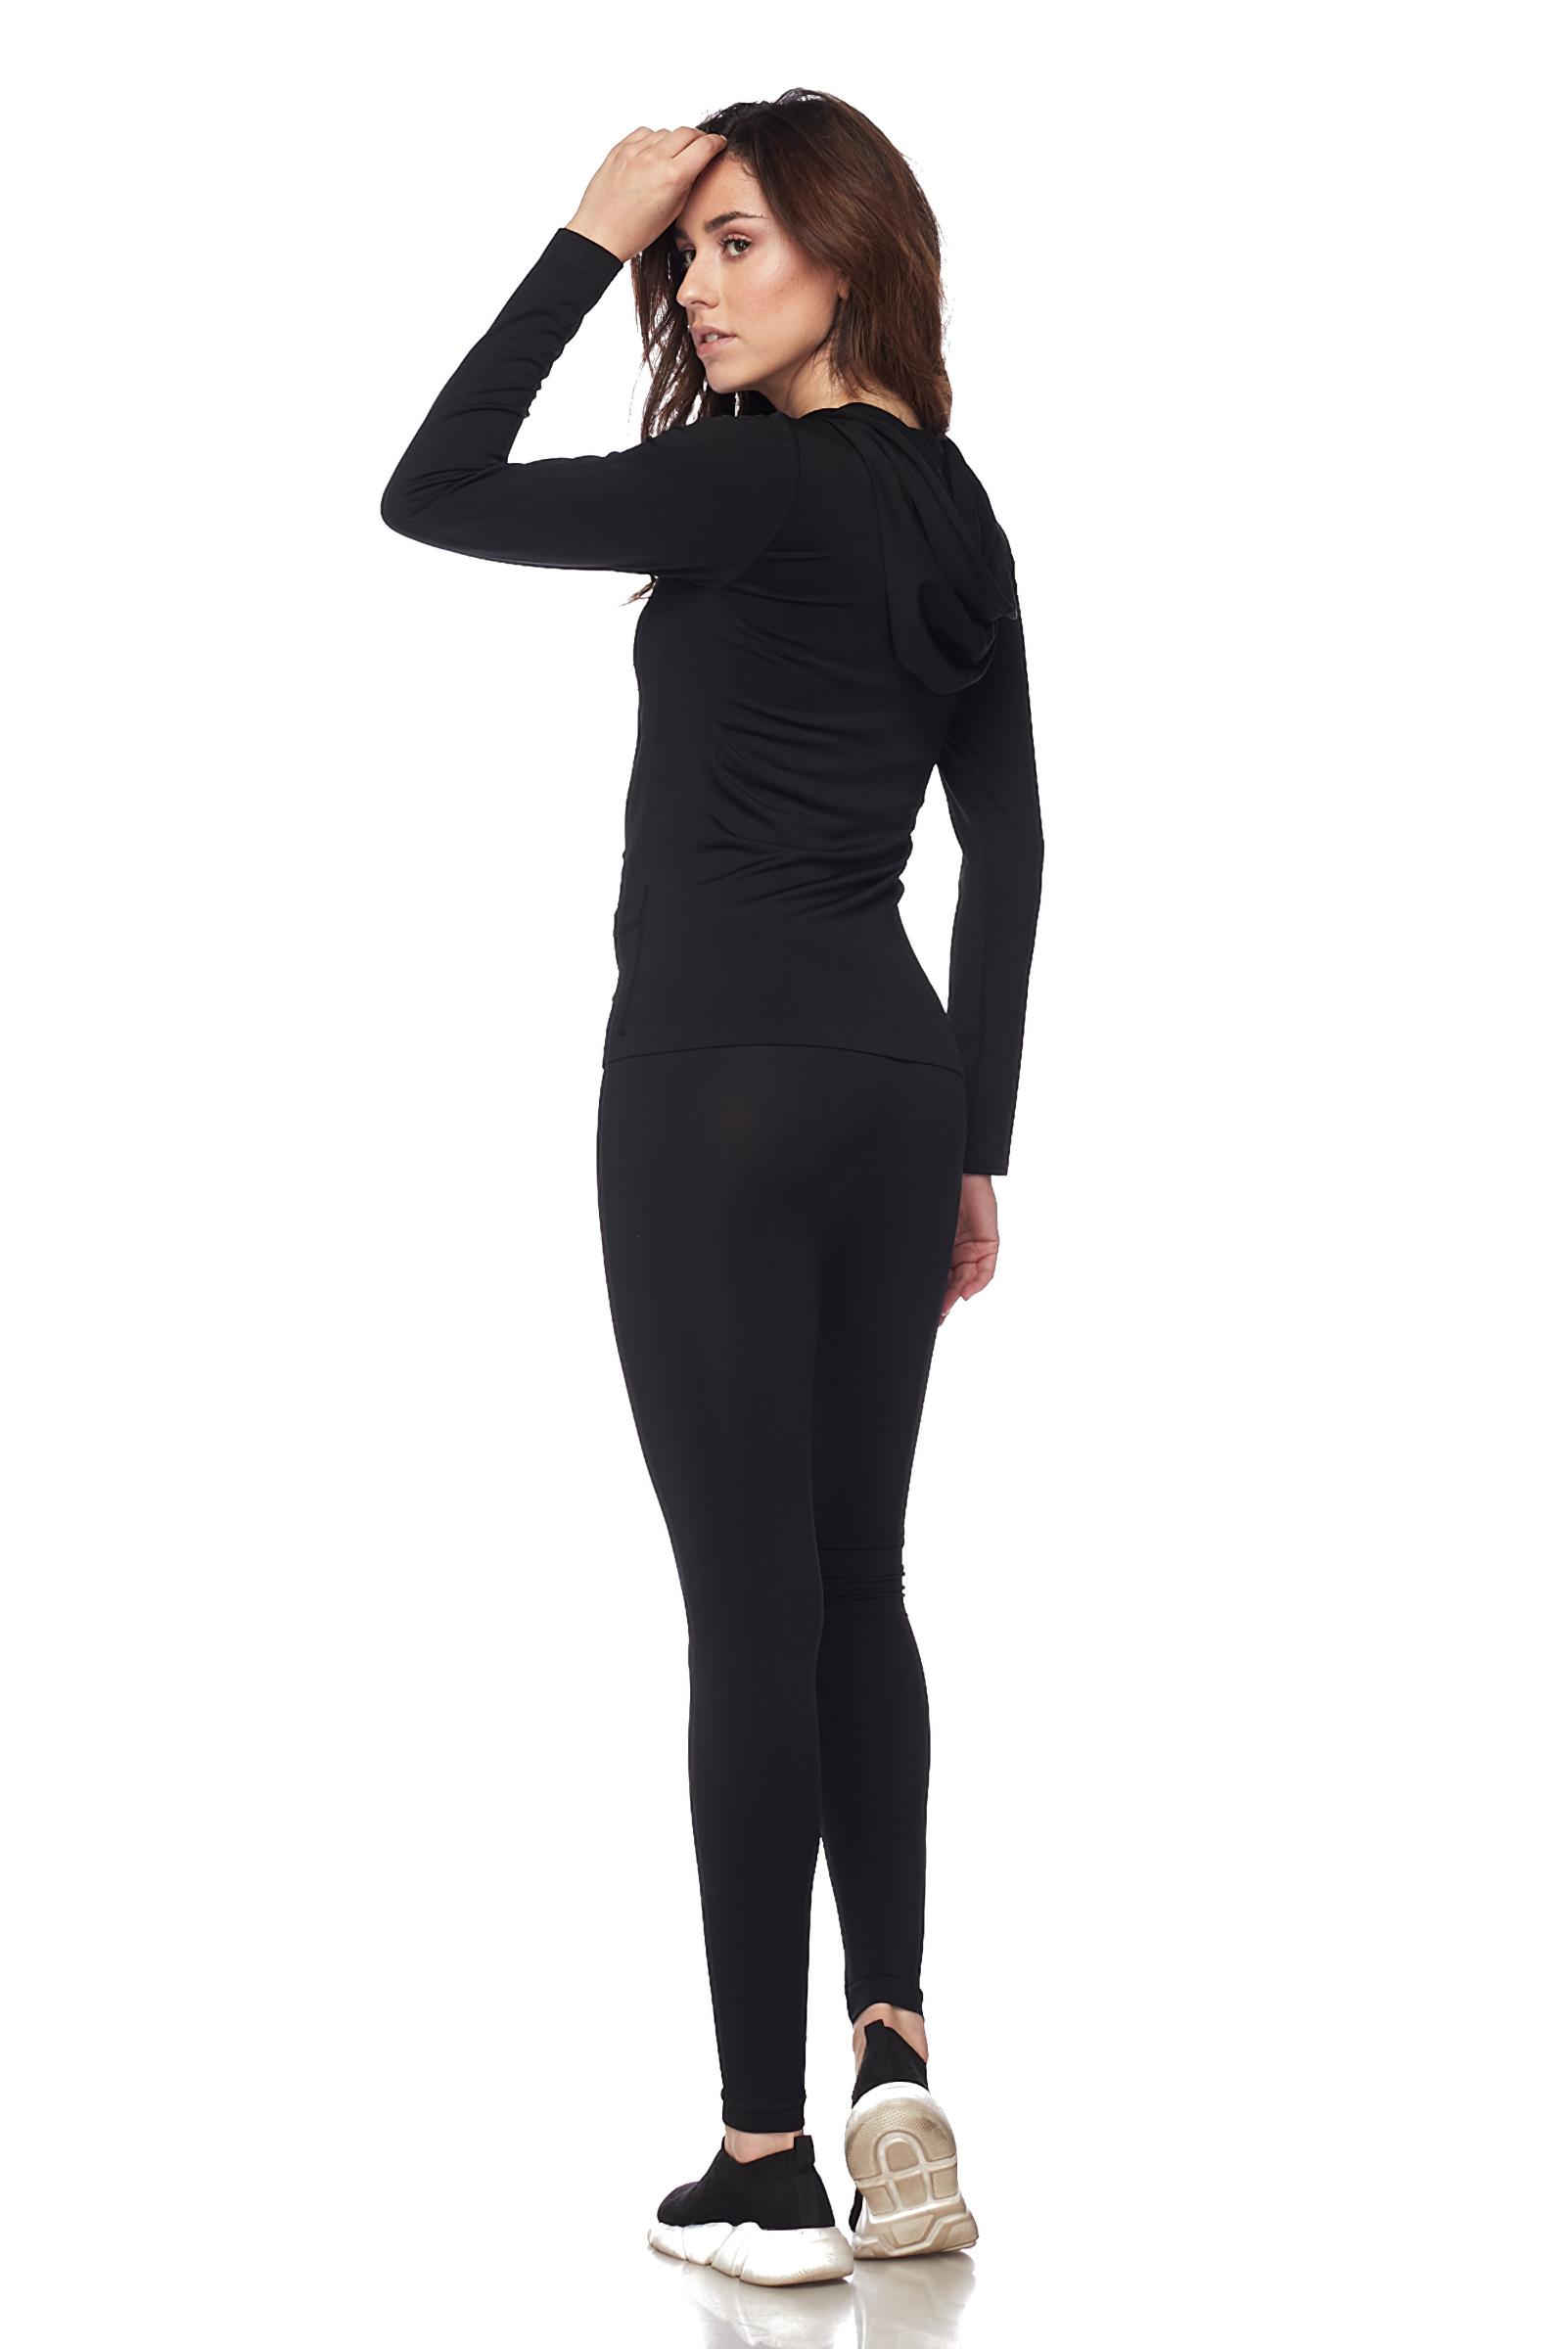 Women-039-s-Juniors-Active-Set-Wear-Zip-Up-Hoodie-and-Legging thumbnail 11